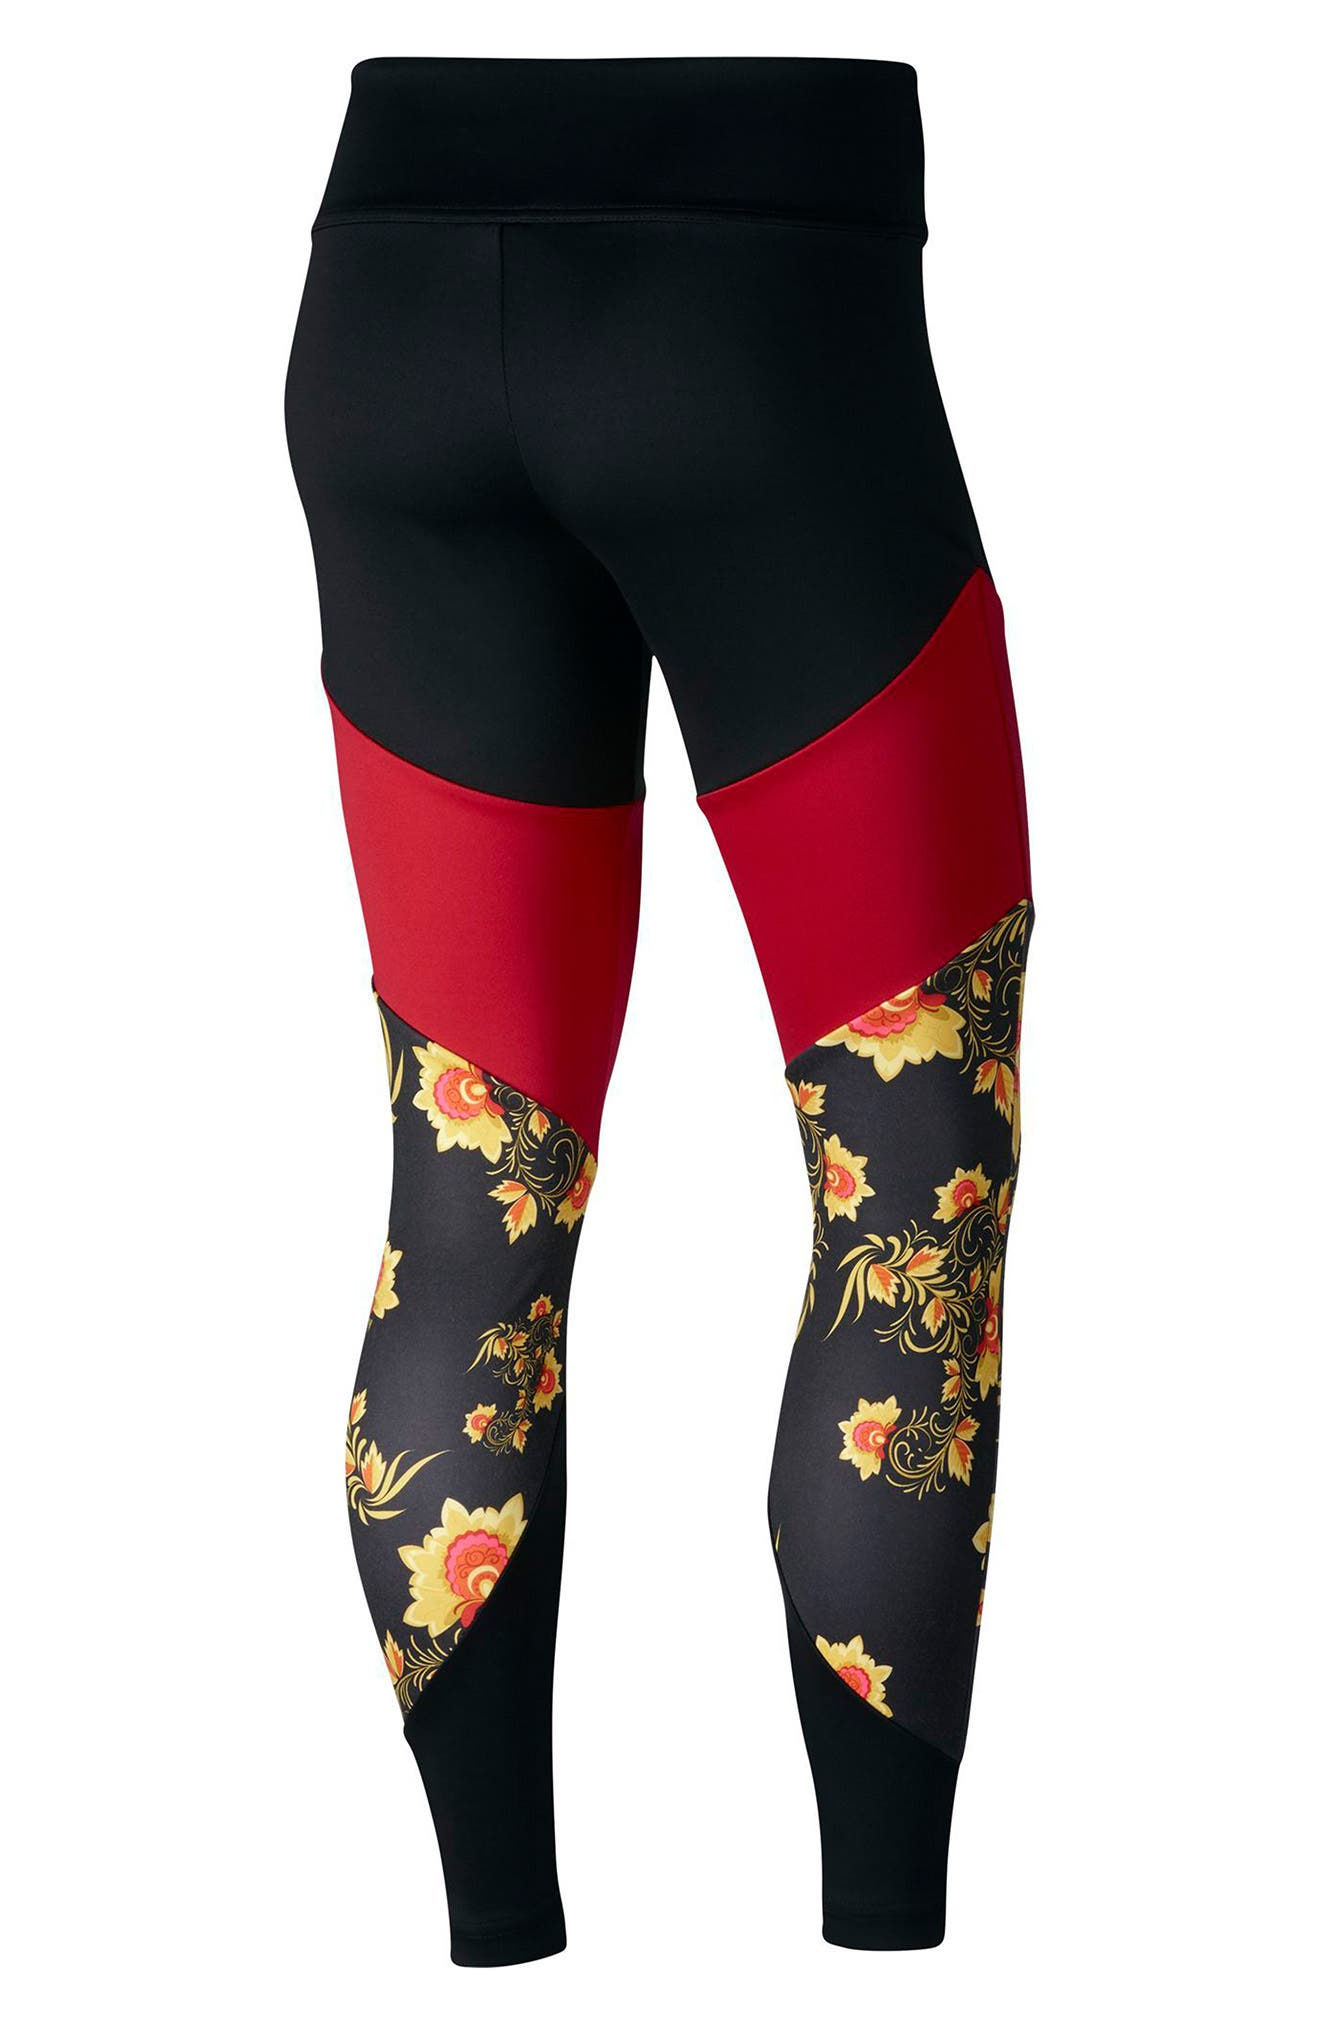 Sportswear Essential Colorblock Floral Women's Leggings,                             Alternate thumbnail 2, color,                             010